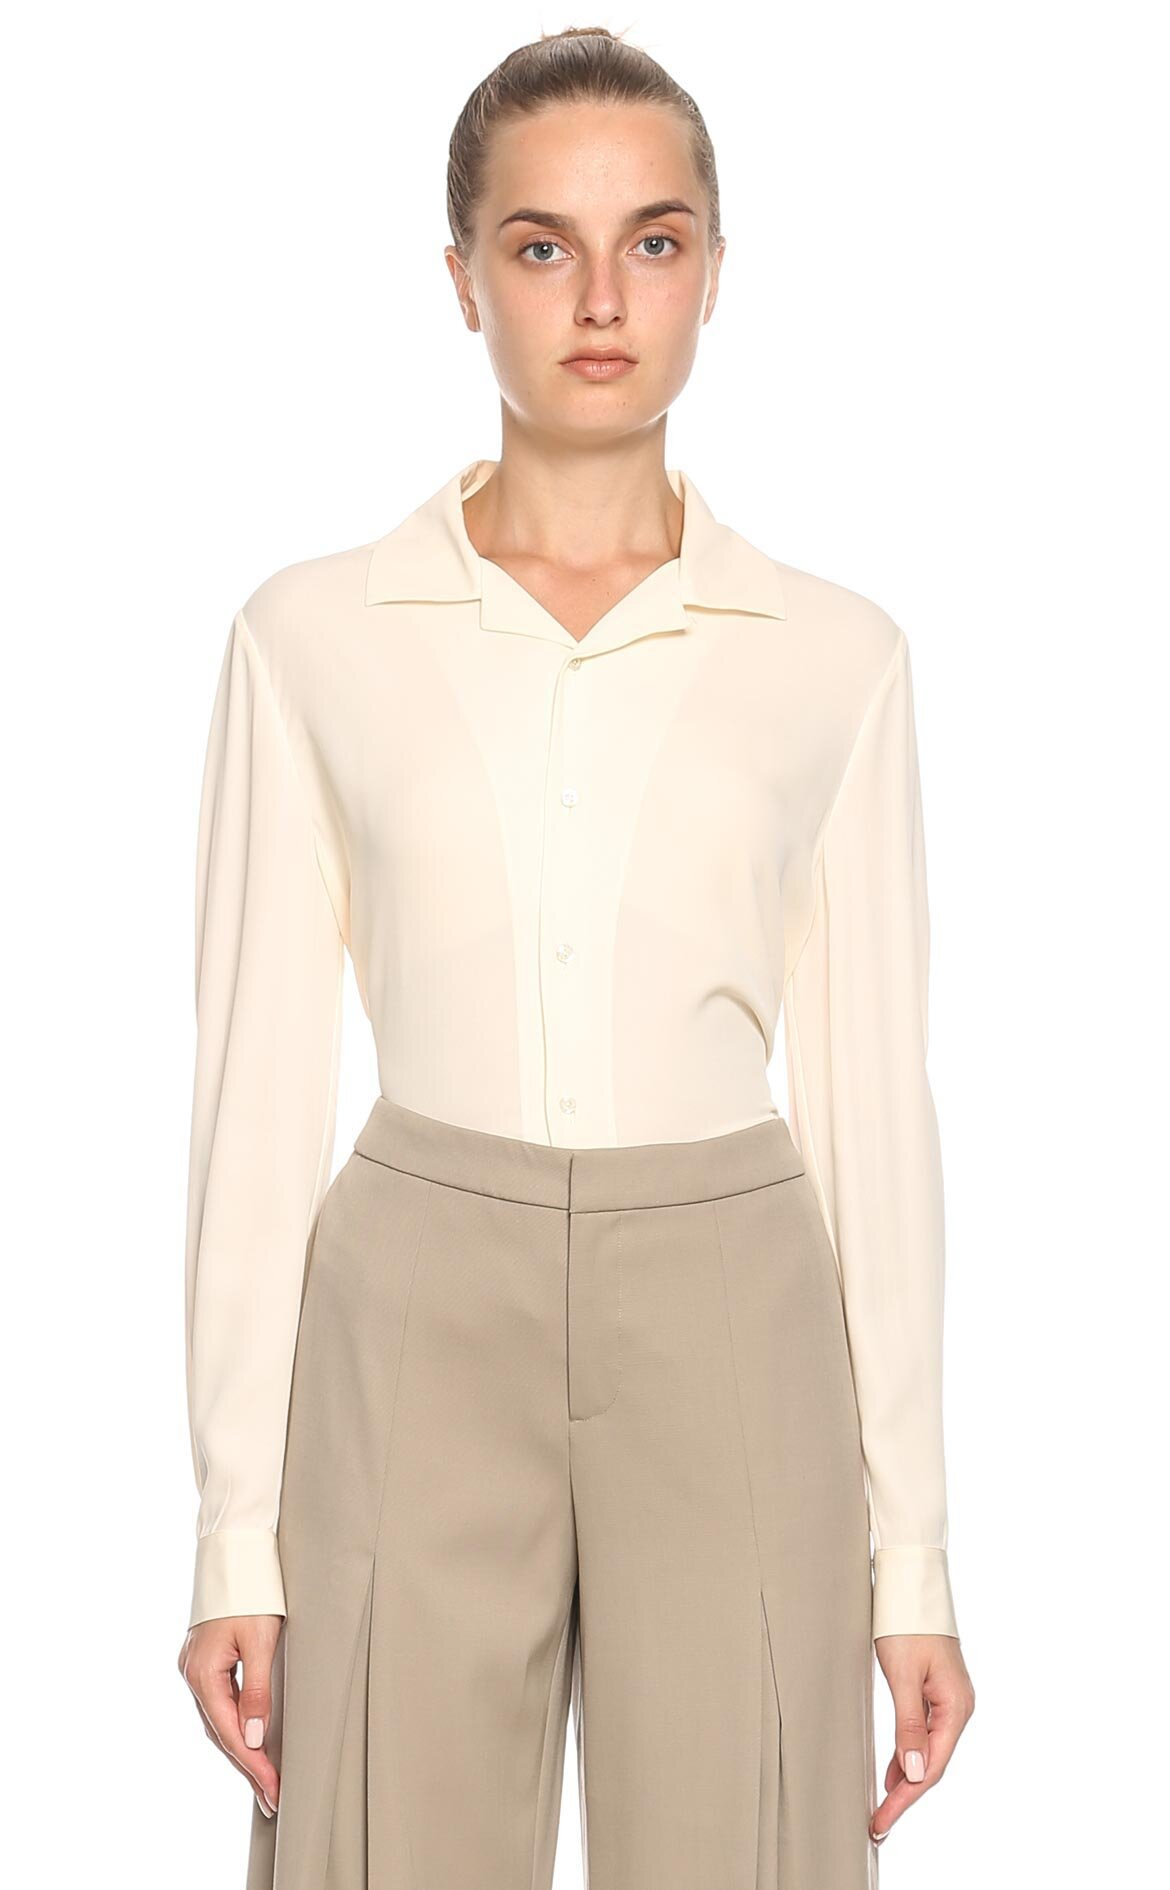 Ralph Lauren Collection  İpek Gömlek